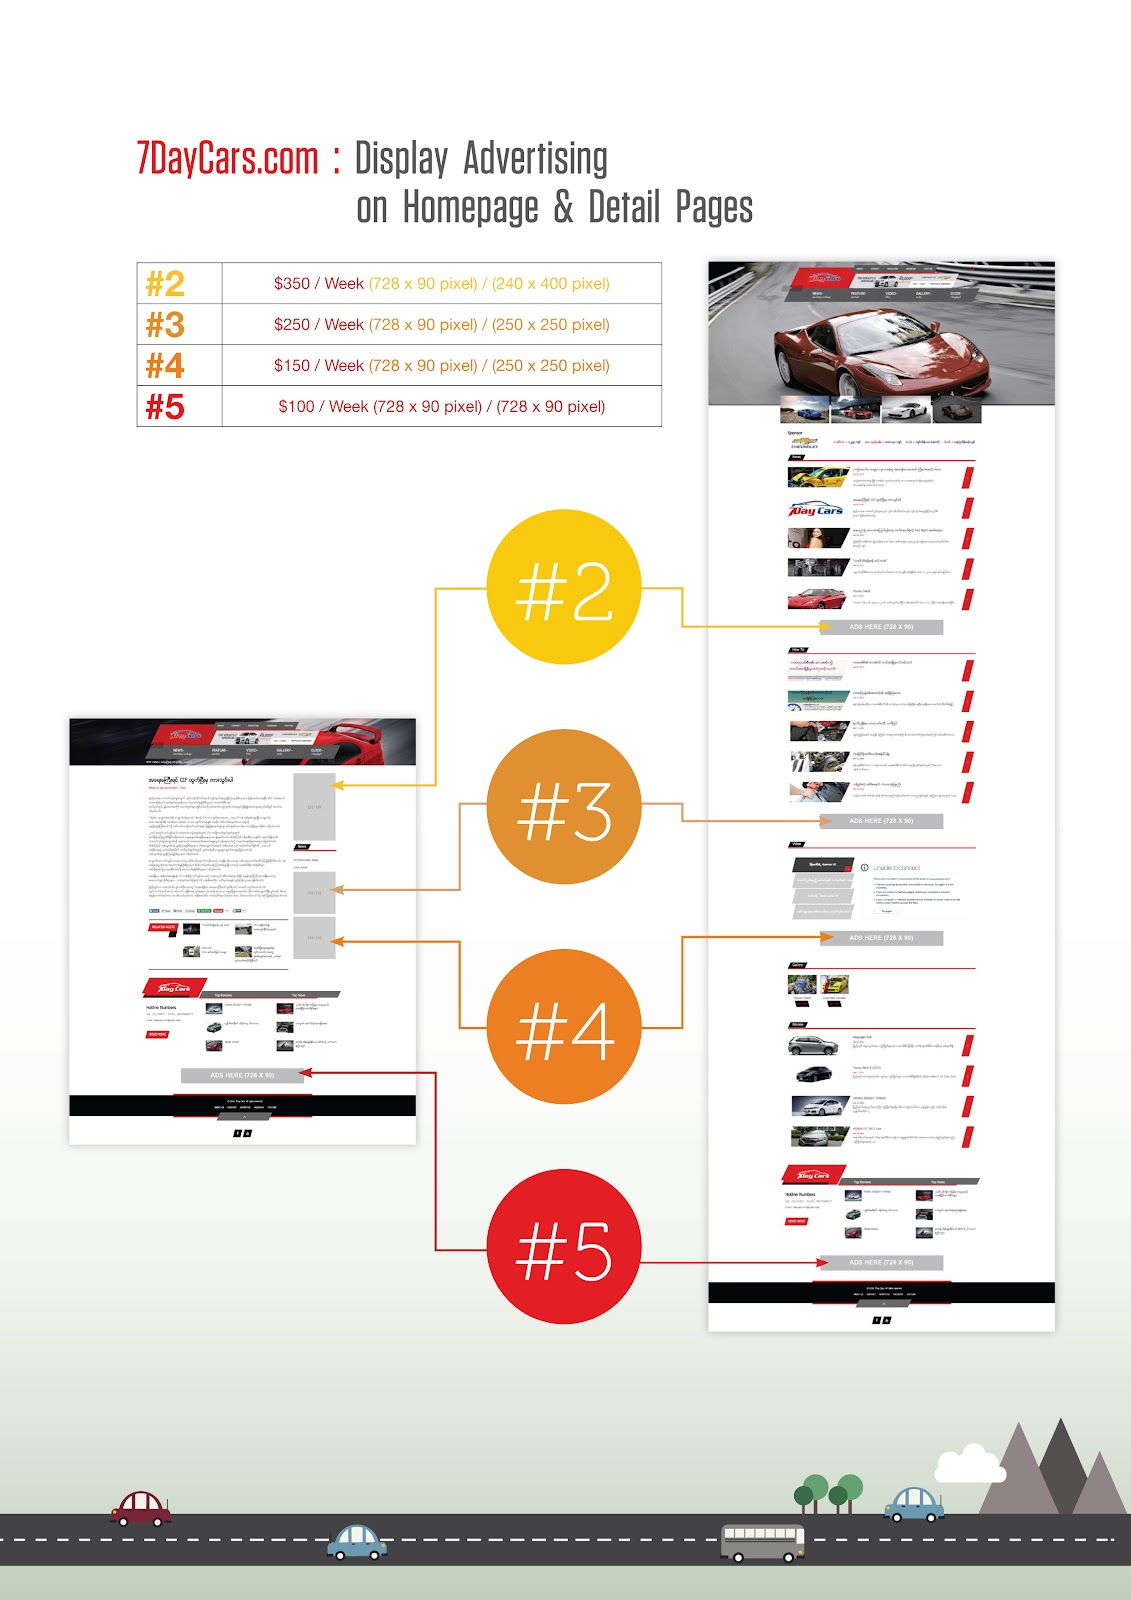 7DayCars-Ads-ratesheet-3.jpg